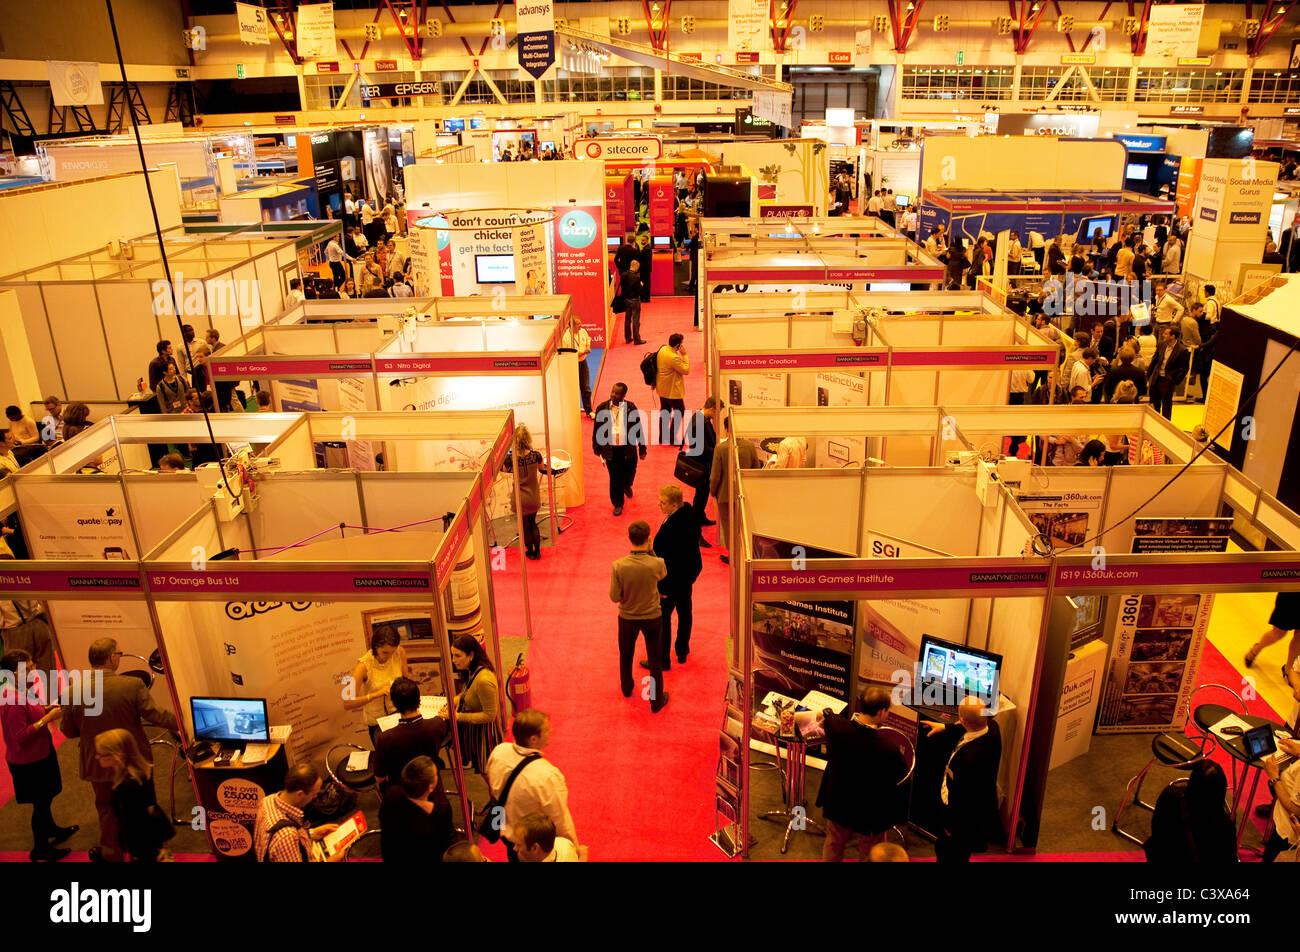 Internet World trade show à Earls Court, Londres Banque D'Images